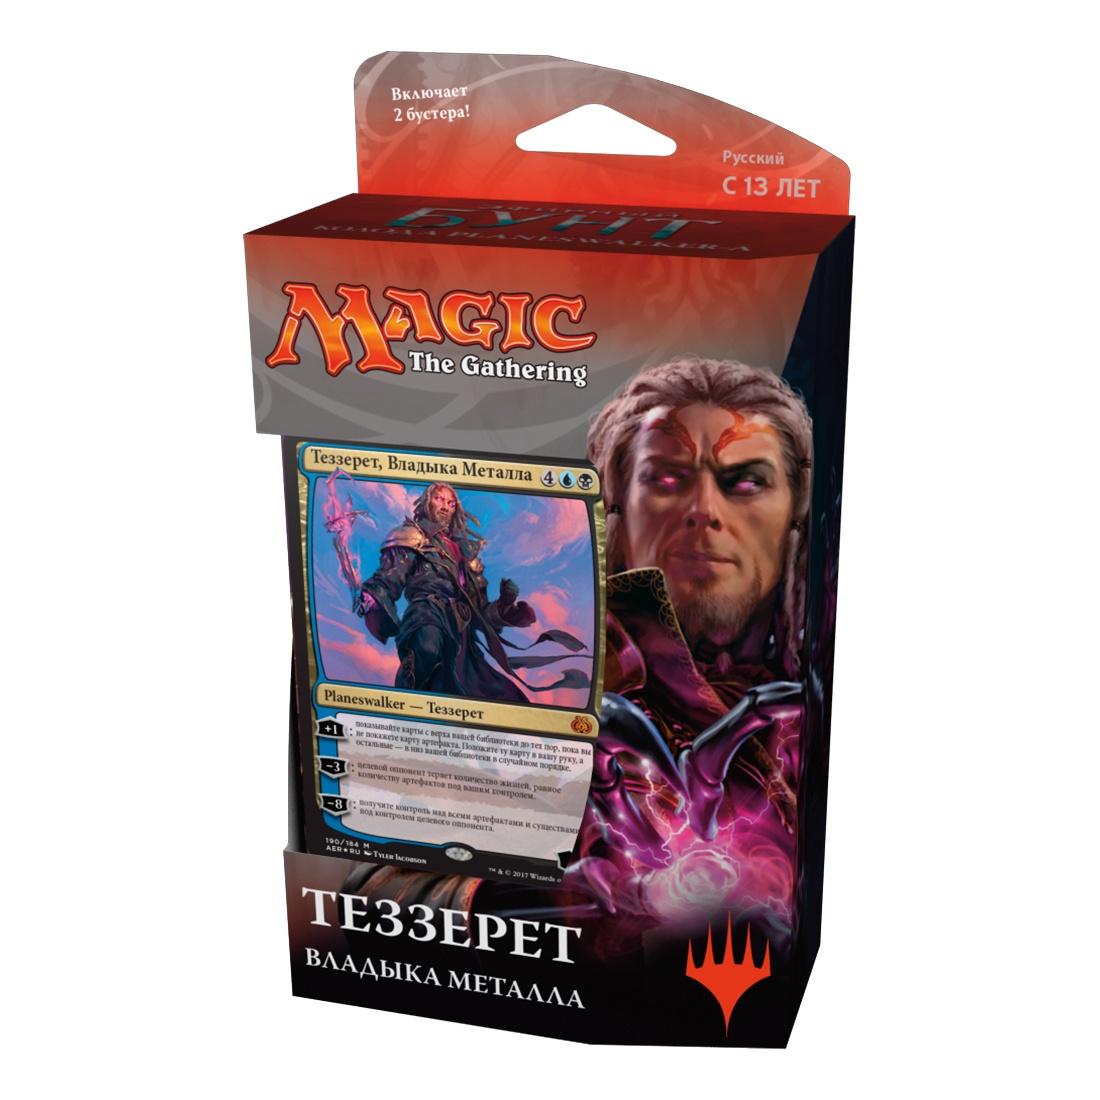 Колода Magic The Gathering Planeswalker'а Теззерет на русском, 60 карт + 2 бустера цена